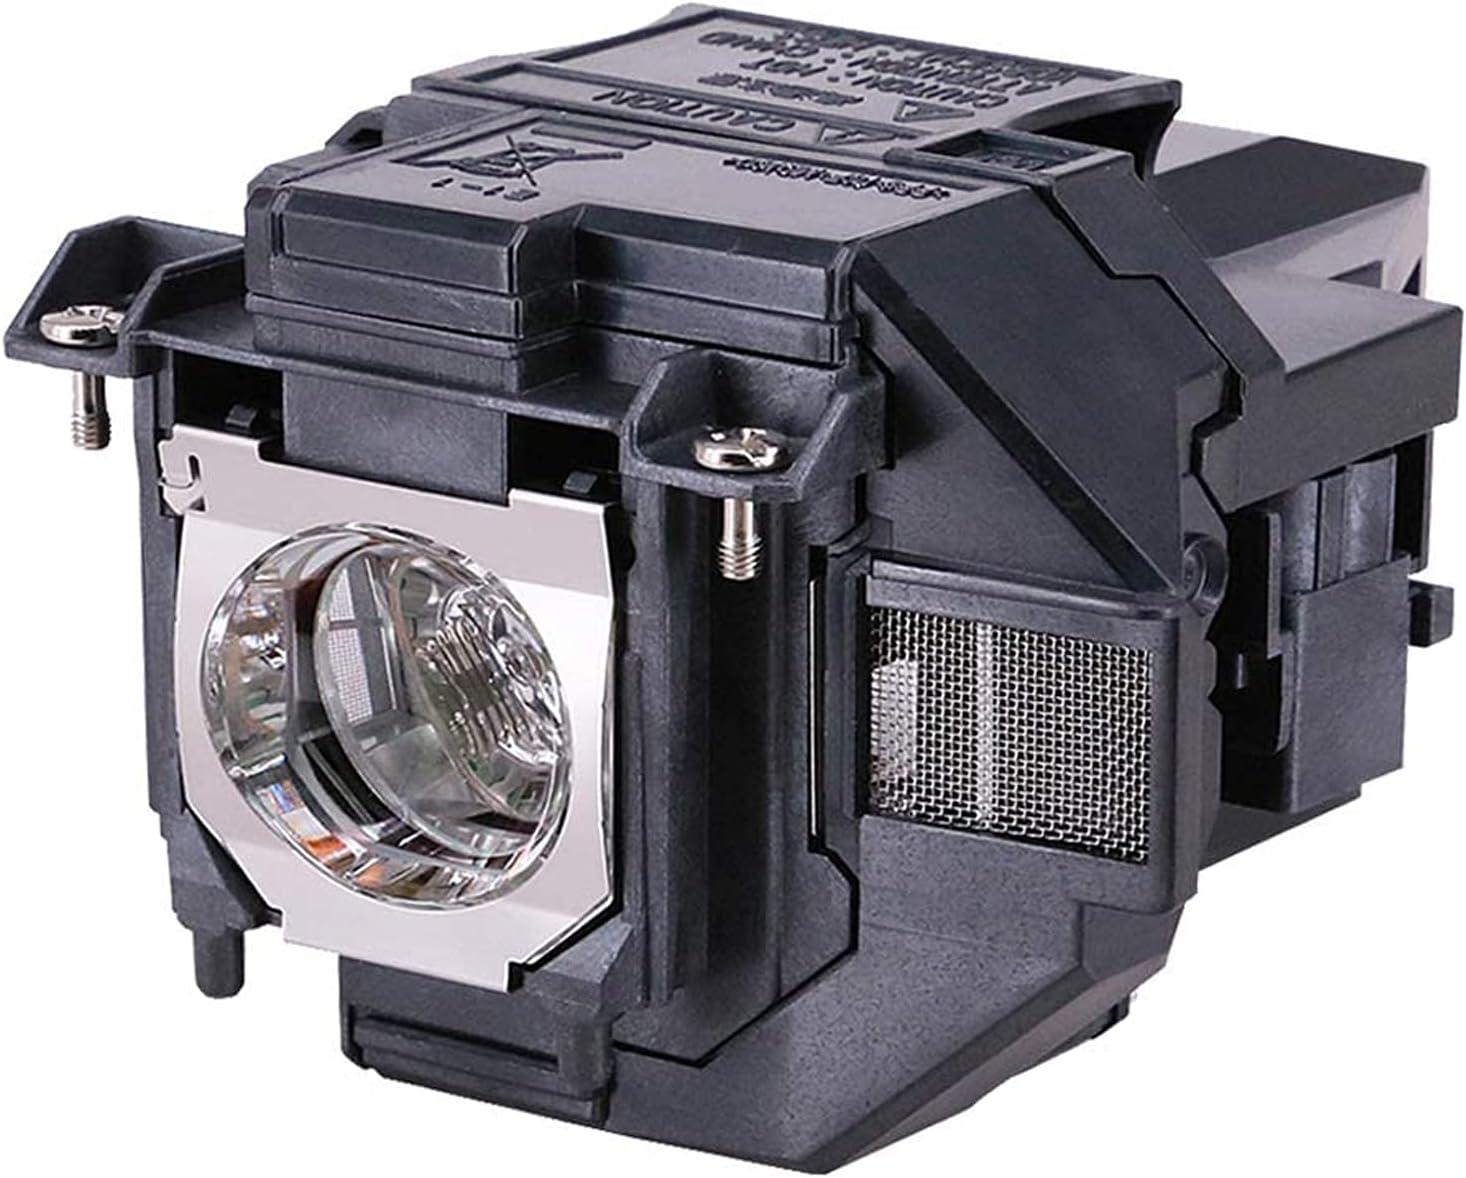 LAKELI Projector Lamp for Epson ELPLP96 v13h010l96 Powerlite Home Cinema 2100 2150 1060 660 760hd VS250 VS350 VS355 EX9210 EX9220 EX3260 EX5260 EX7260 Projector Lamp Bulb